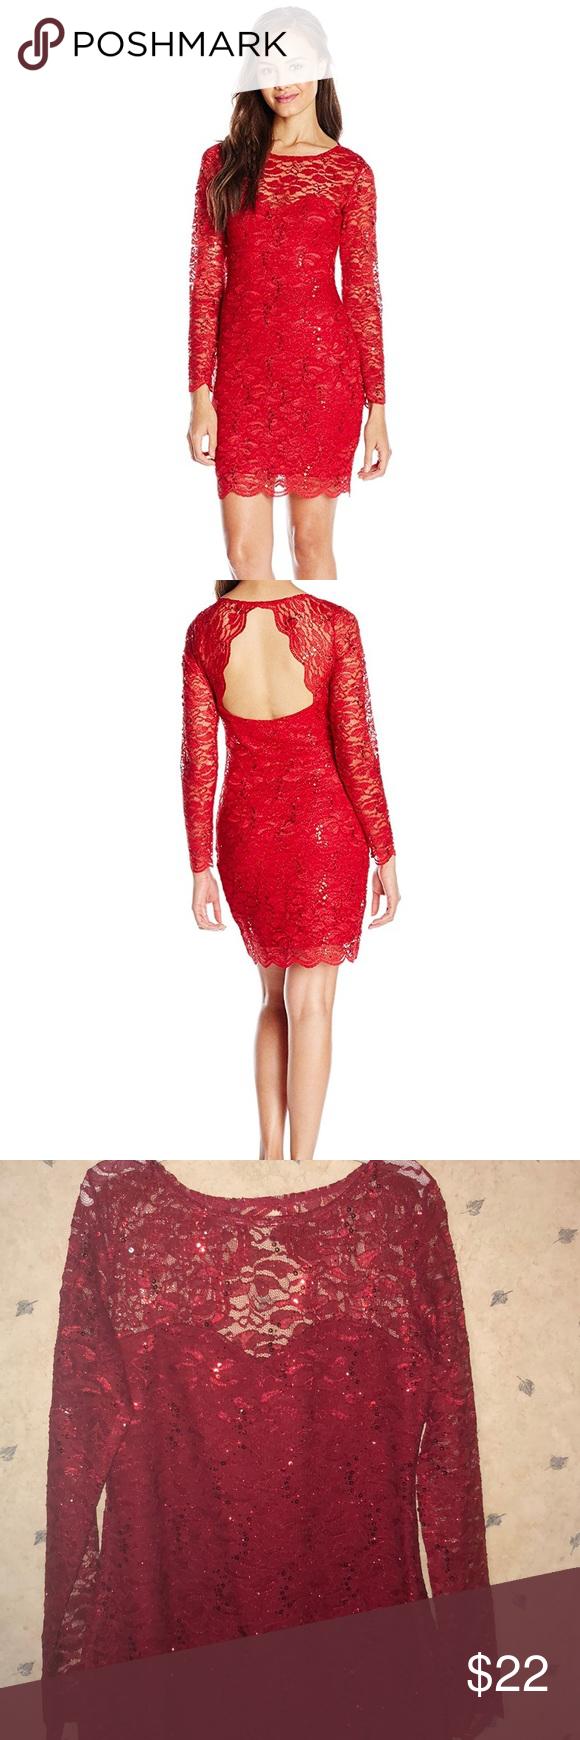 Red glitter u lace bodycon dress nwt red glitter bodycon style